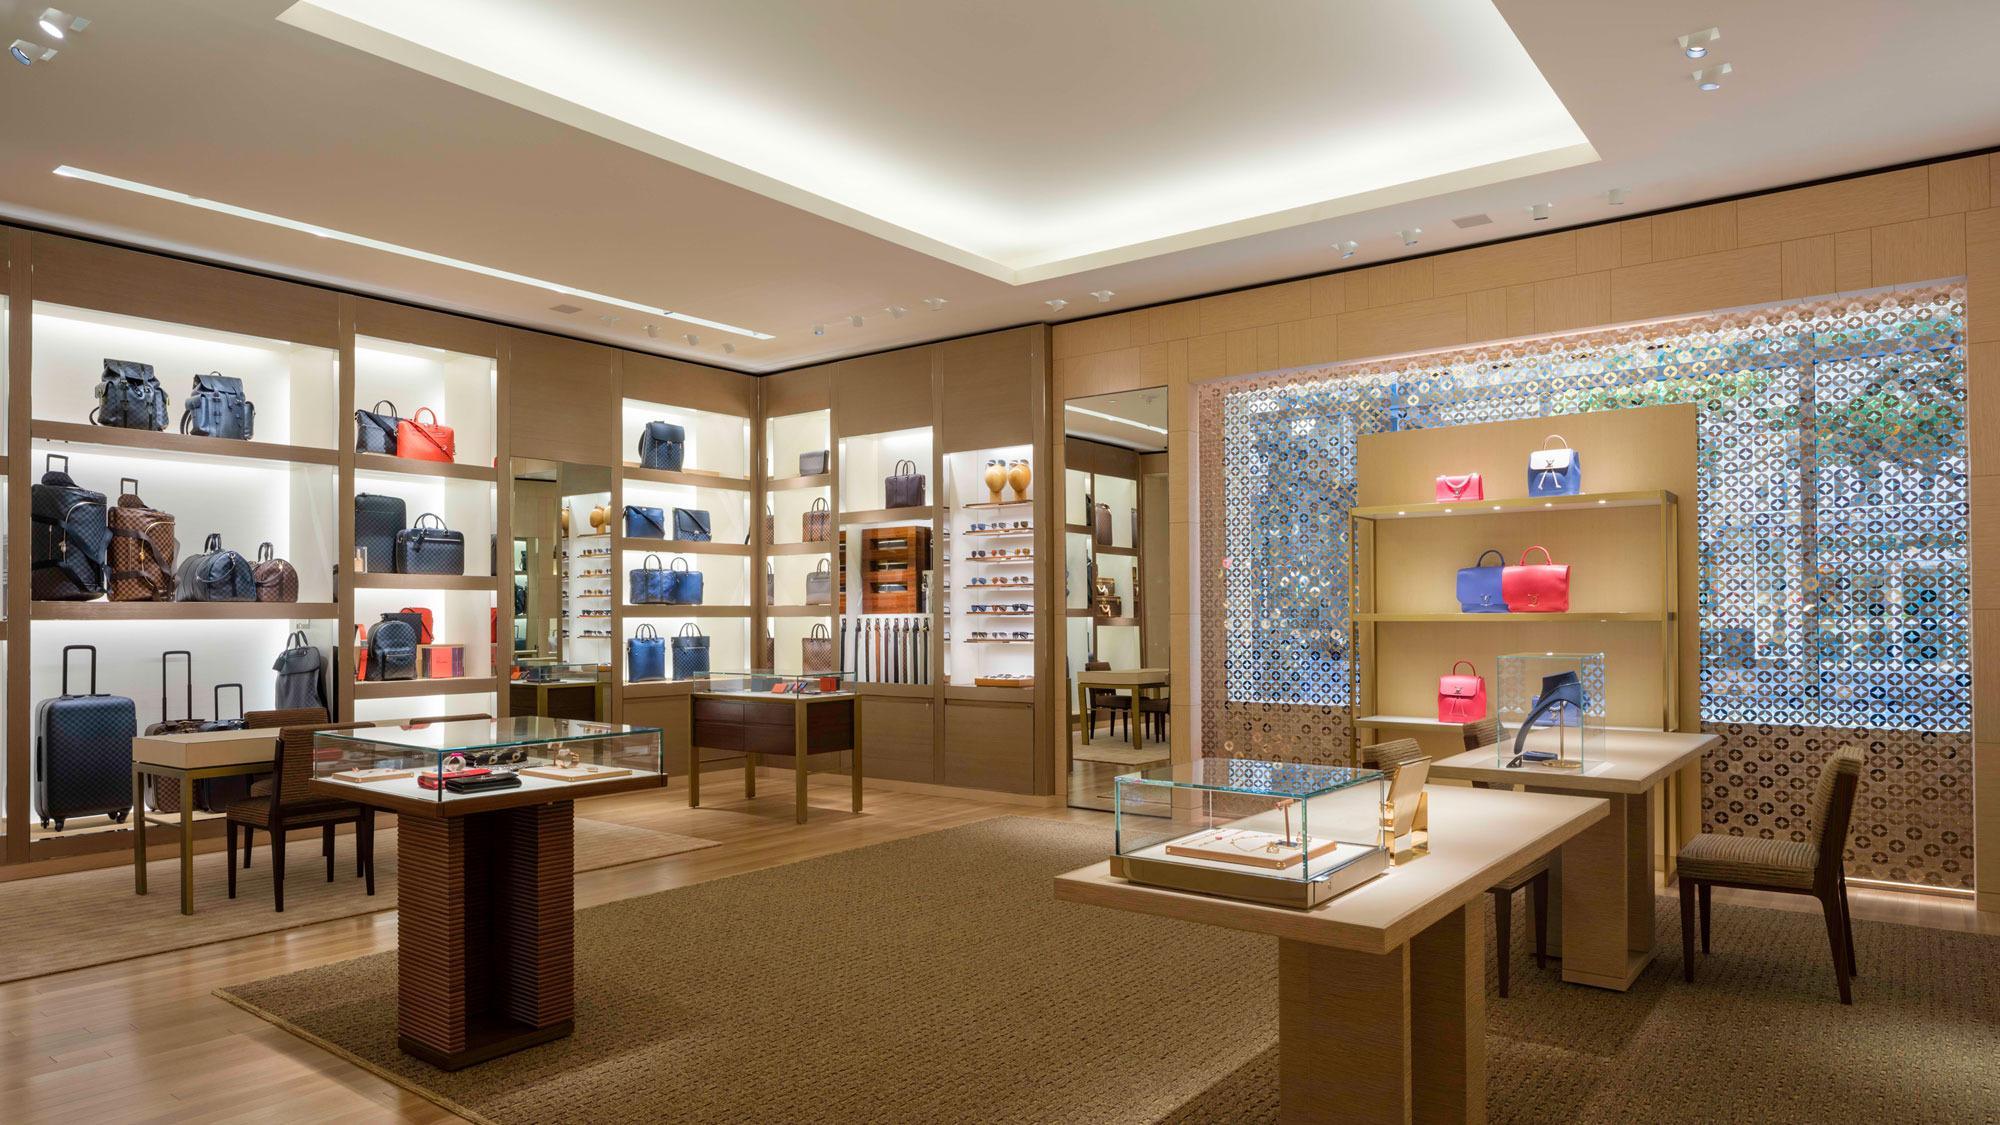 Louis Vuitton Seattle Nordstrom image 2